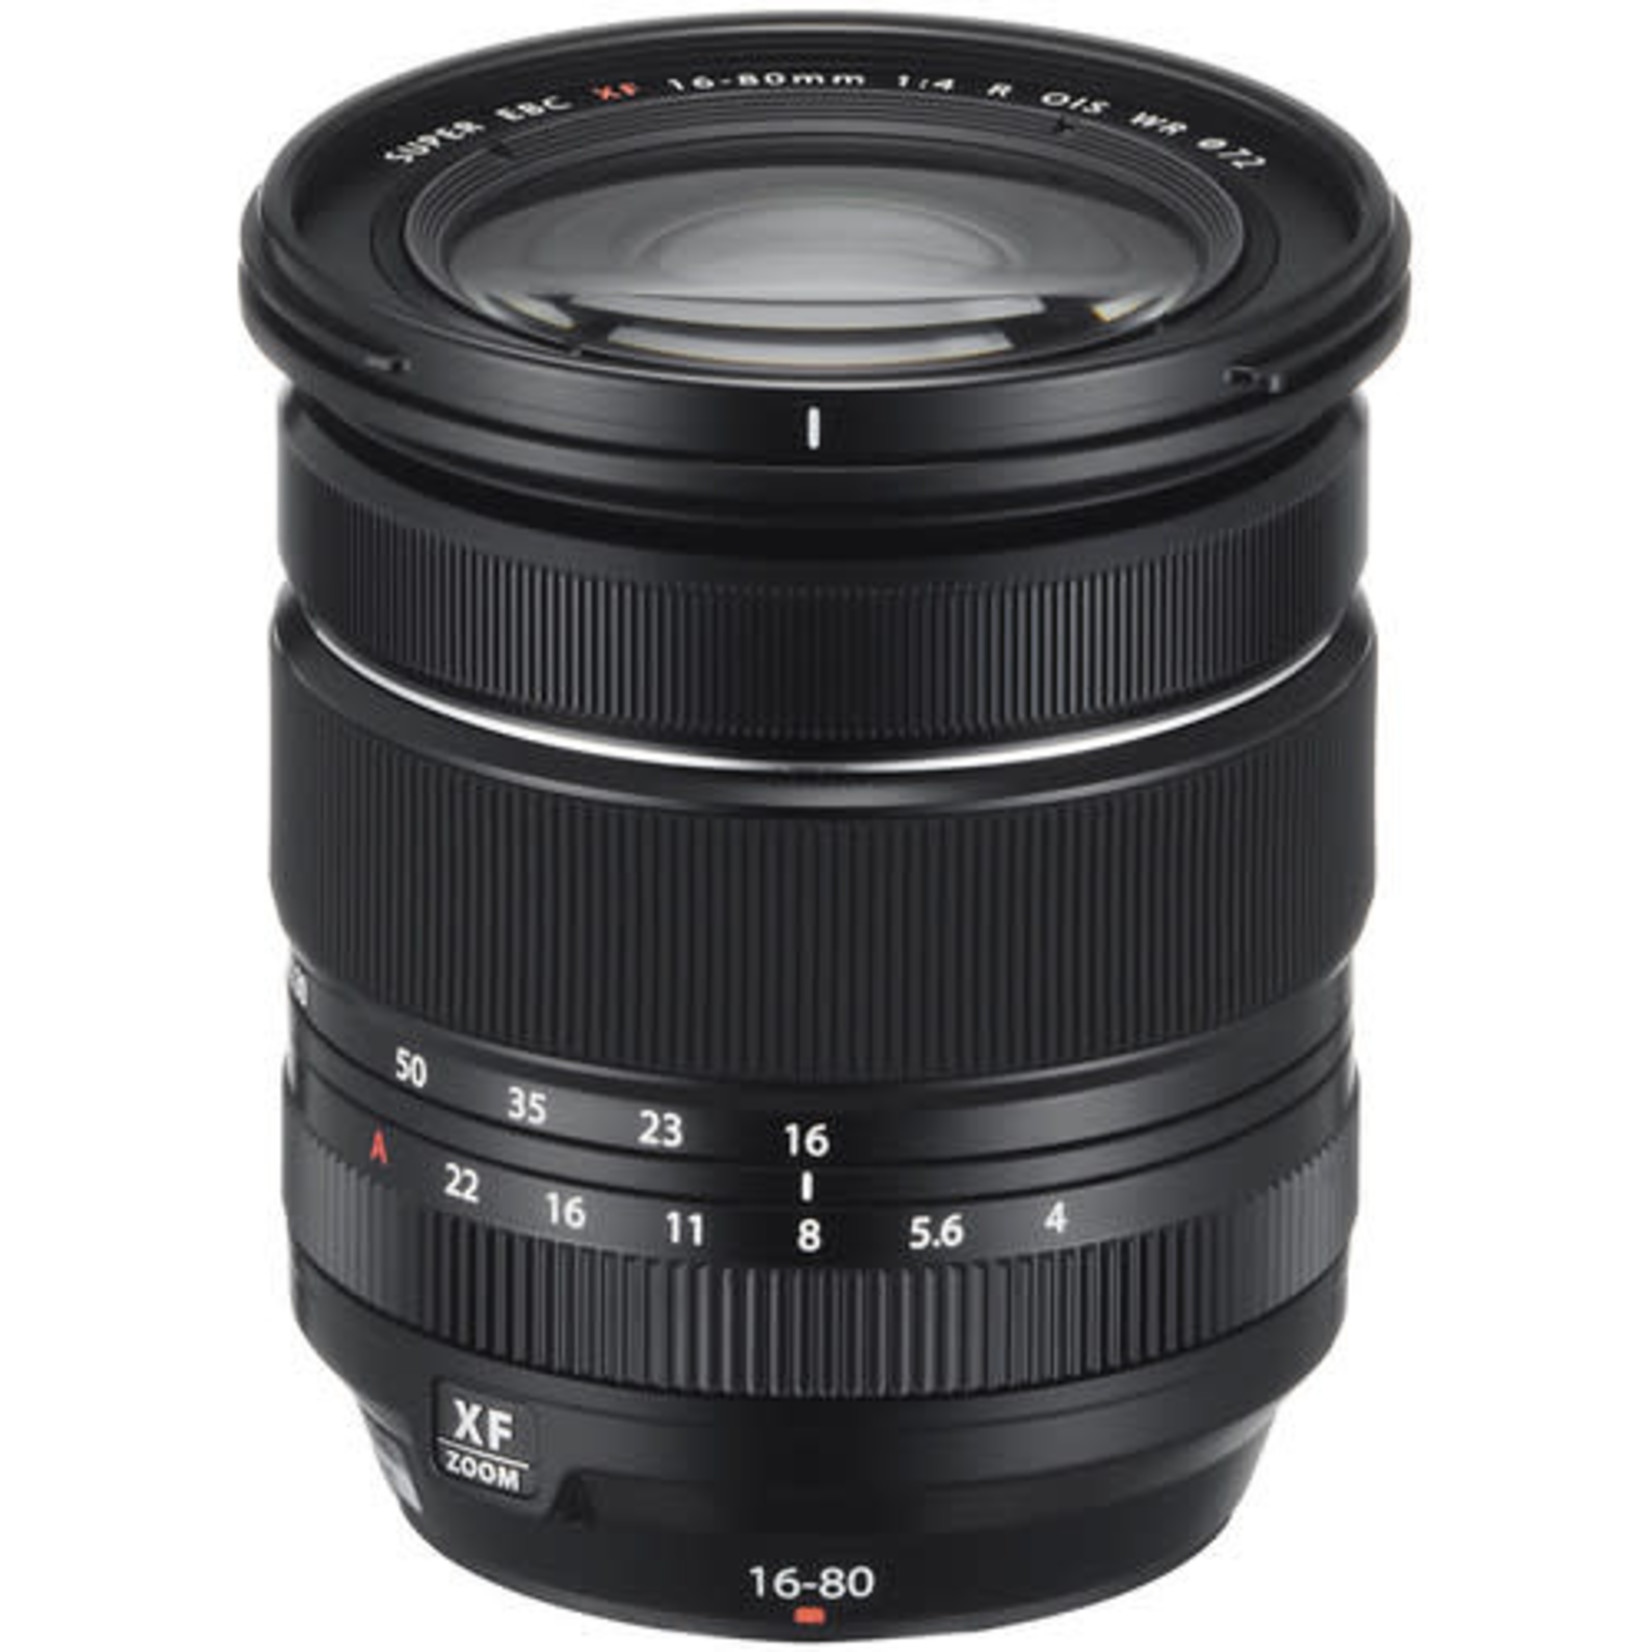 FujiFilm FujiFIlm XF 16-80mm f/4 R OIS WR Lens